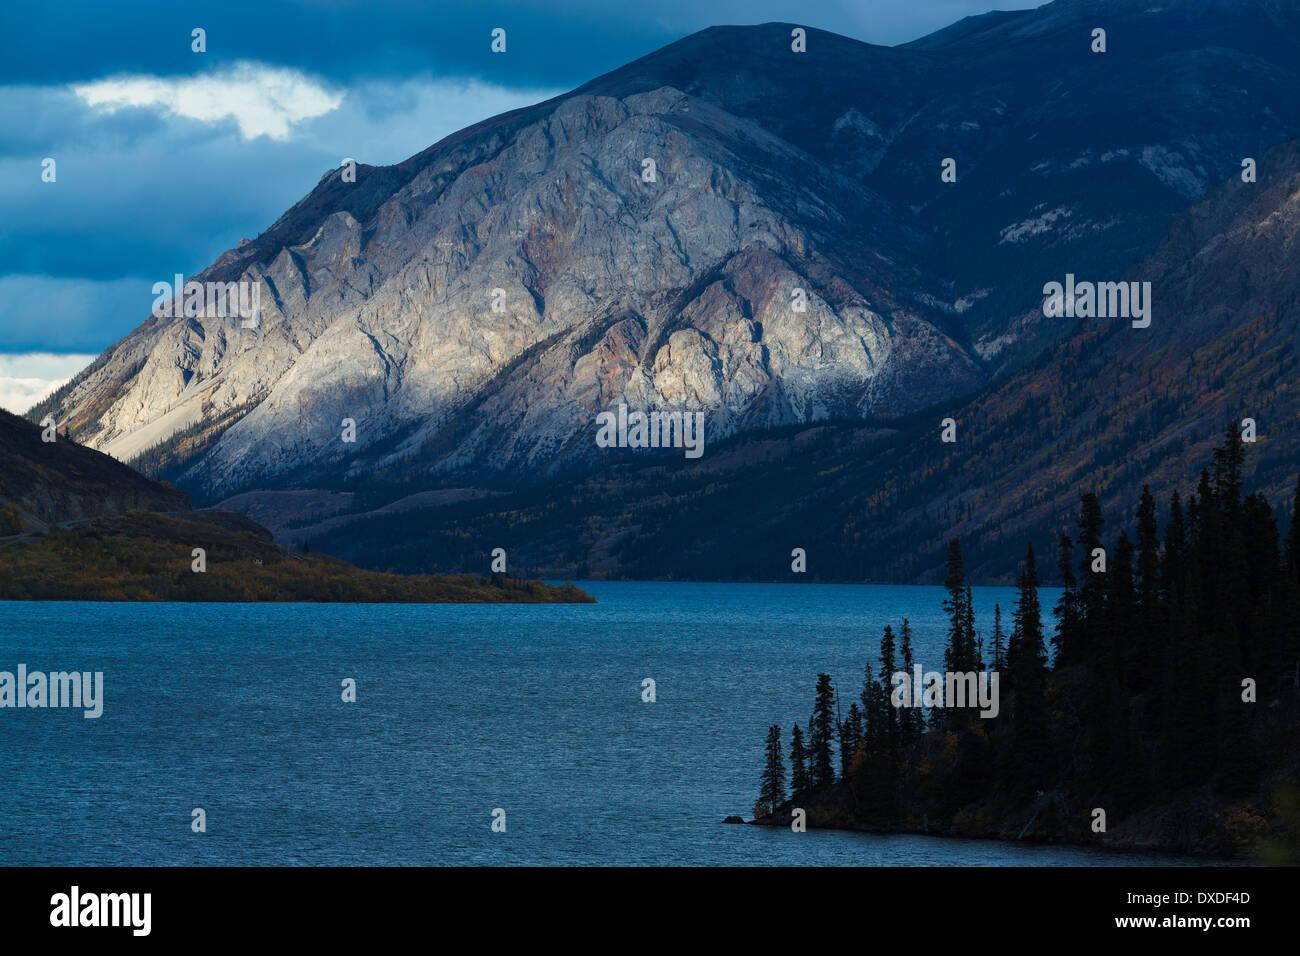 Escarpment Mountain on Lake Tagish near Carcross, Yukon Territories, Canada - Stock Image